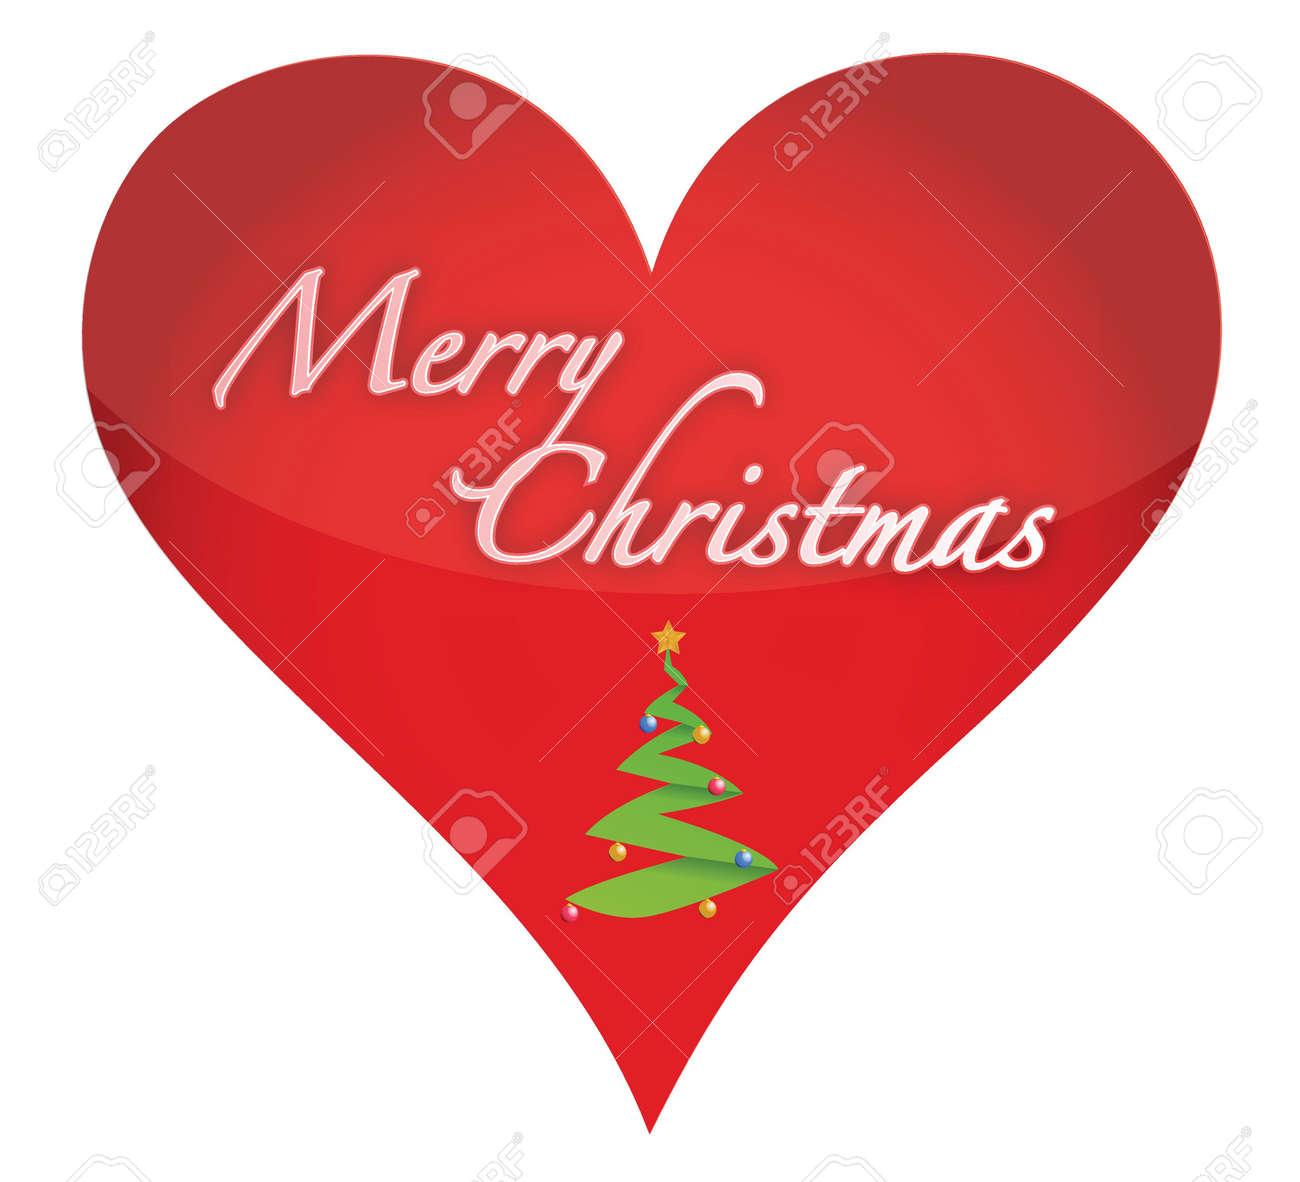 Merry Christmas Heart Illustration Design Over White Royalty Free ...